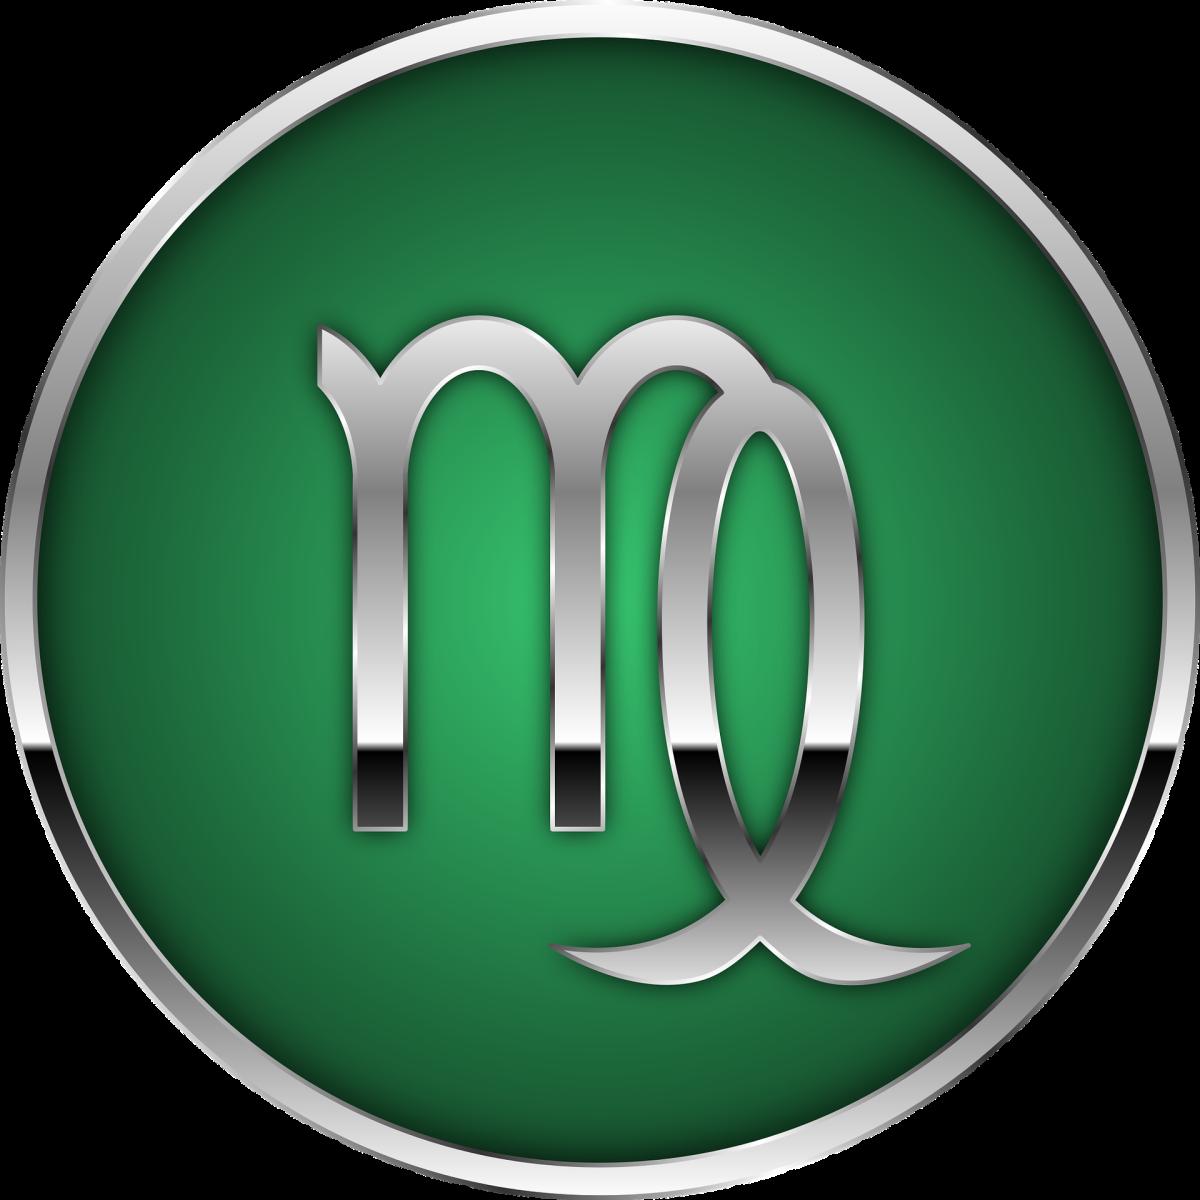 horoscope-matching-leo-with-virgo-relationship-compatibility